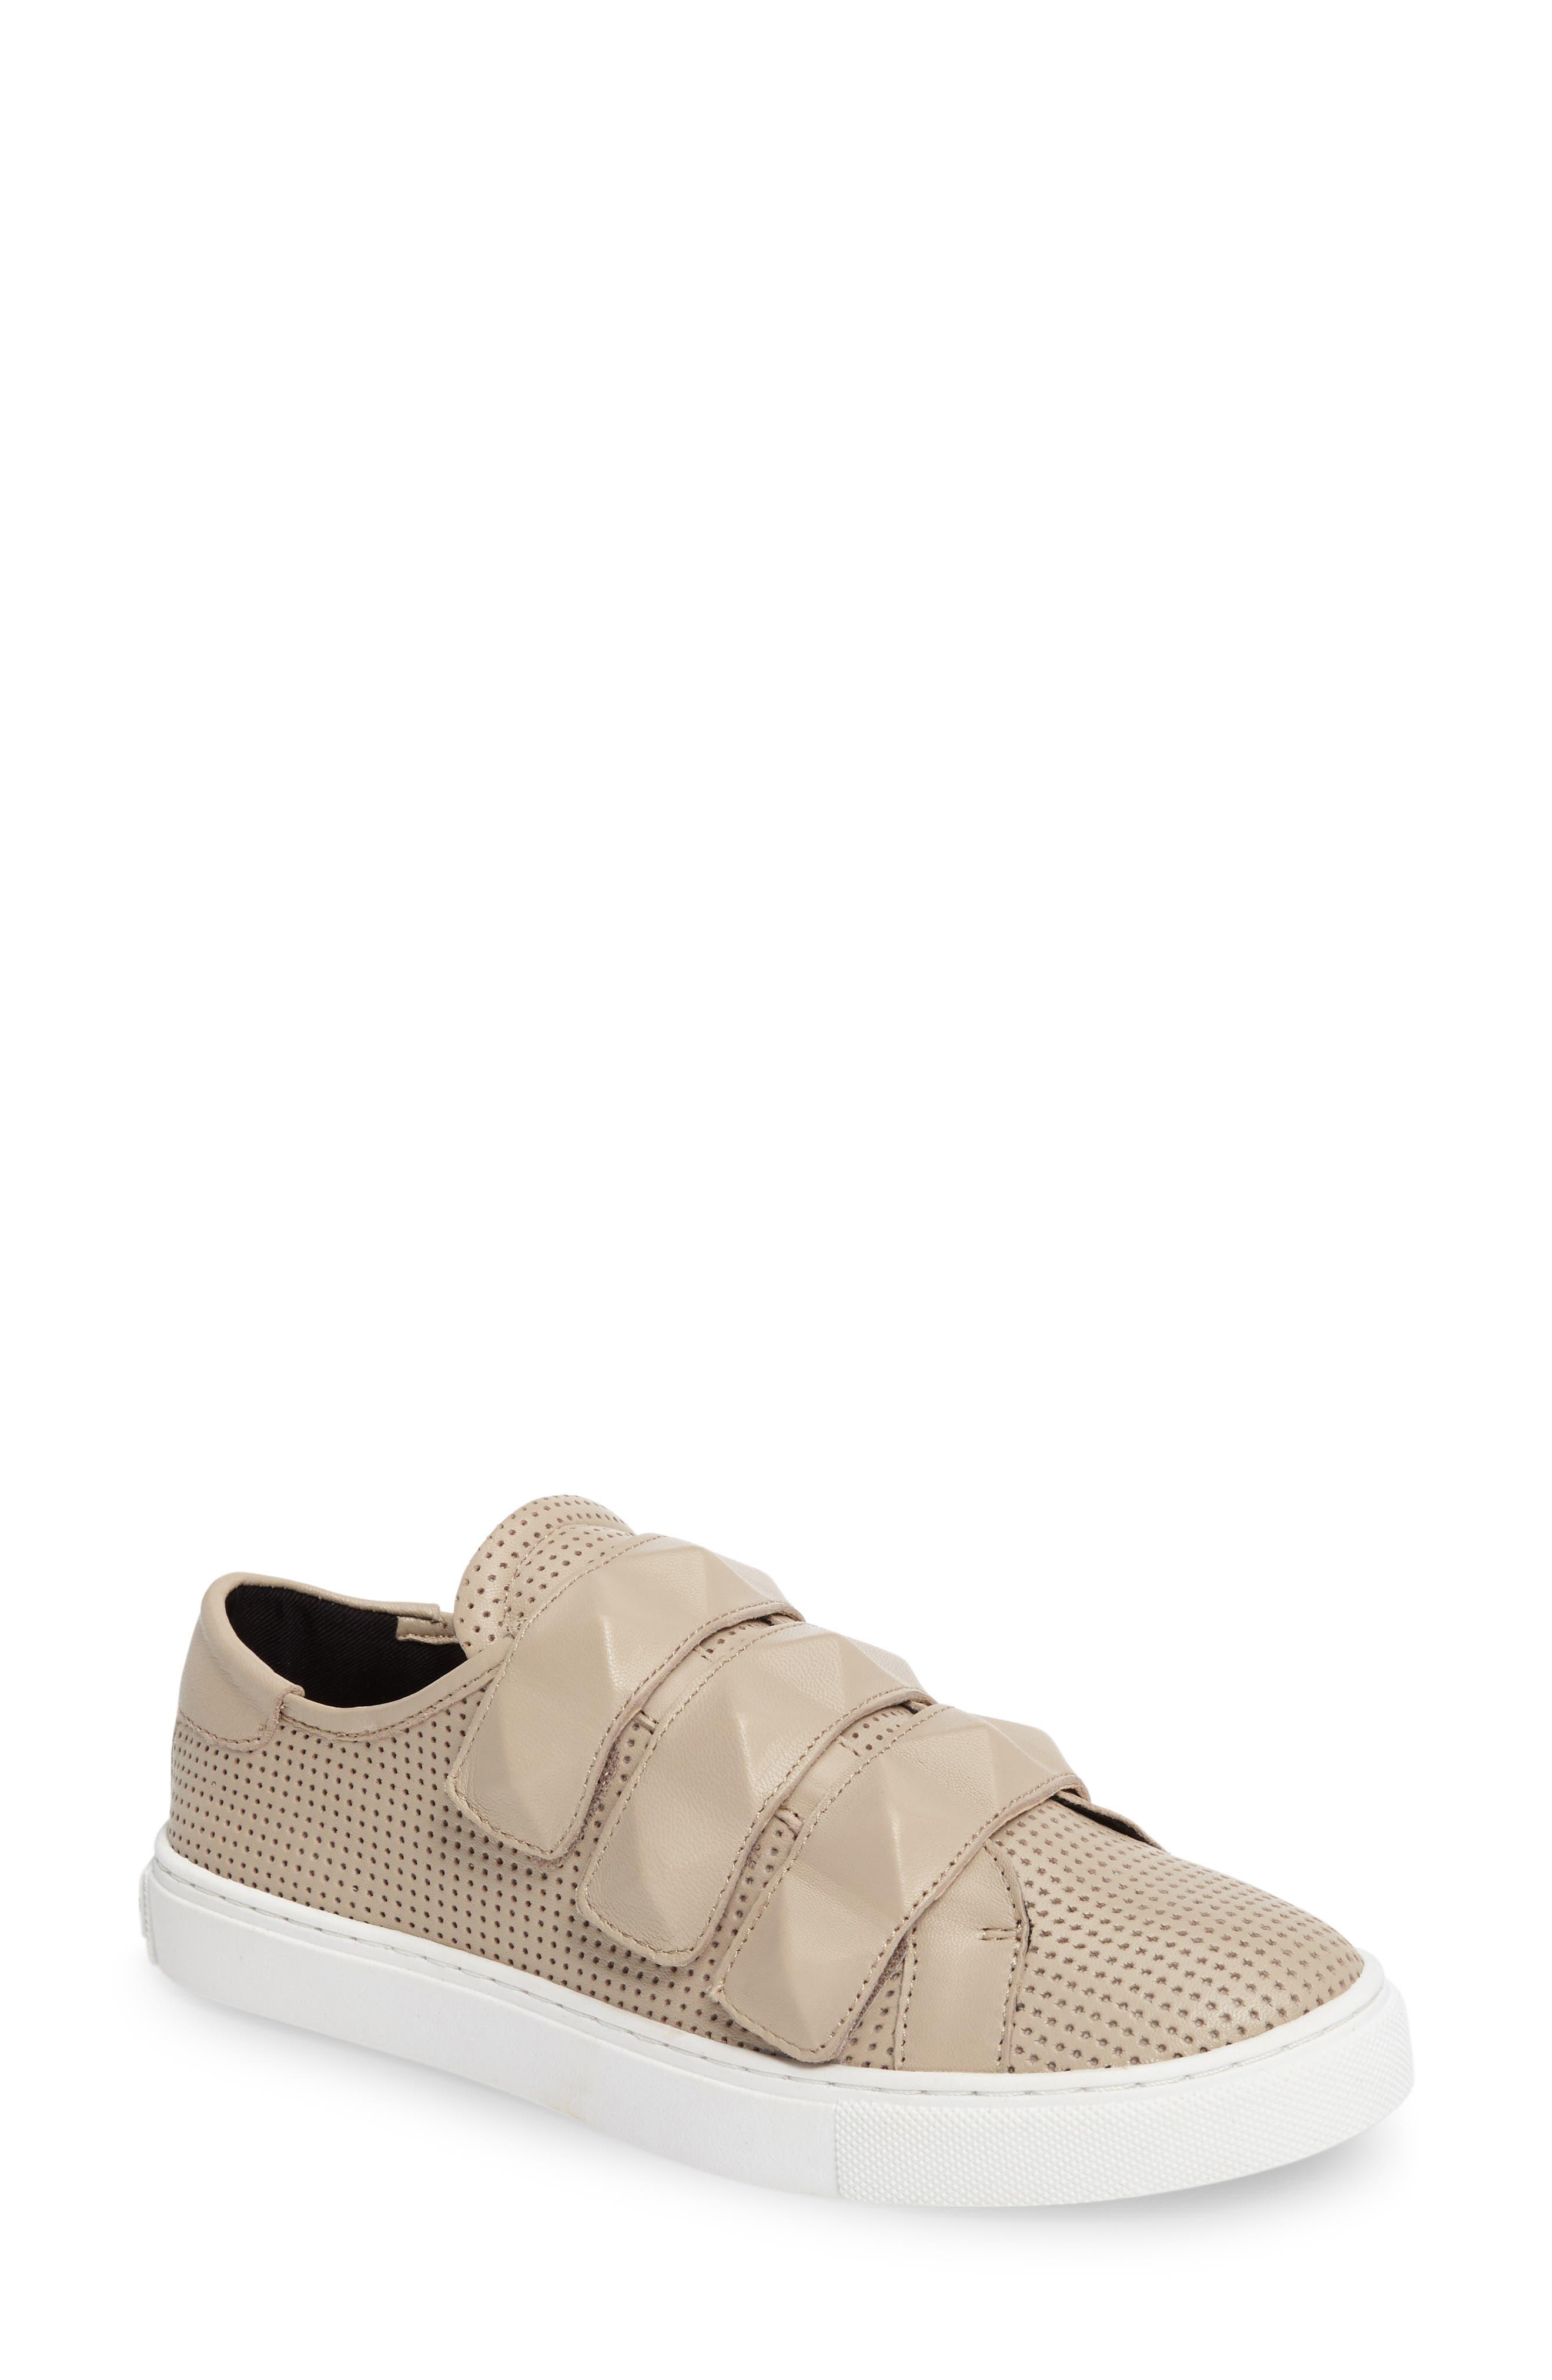 REBECCA MINKOFF 'Becky' Embellished Sneaker